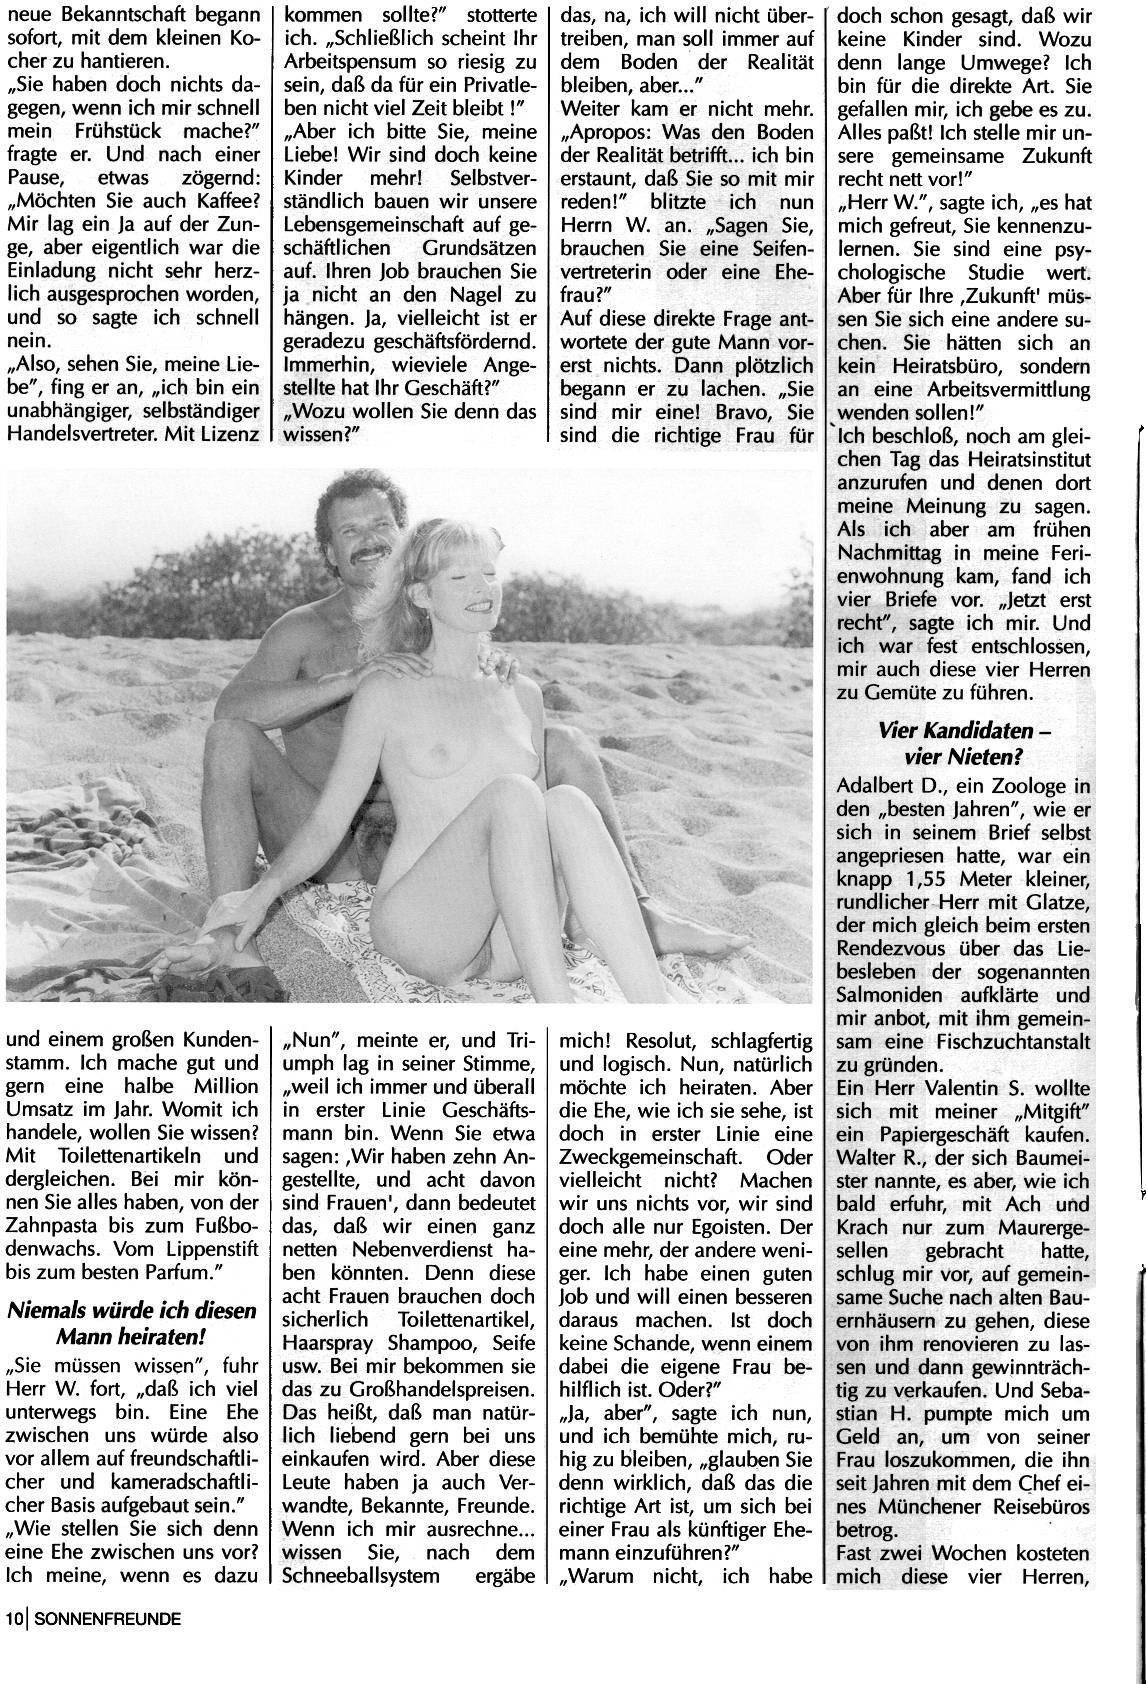 Nudist Magazines Sonnenfreunde 1993 Nr.7 - 2